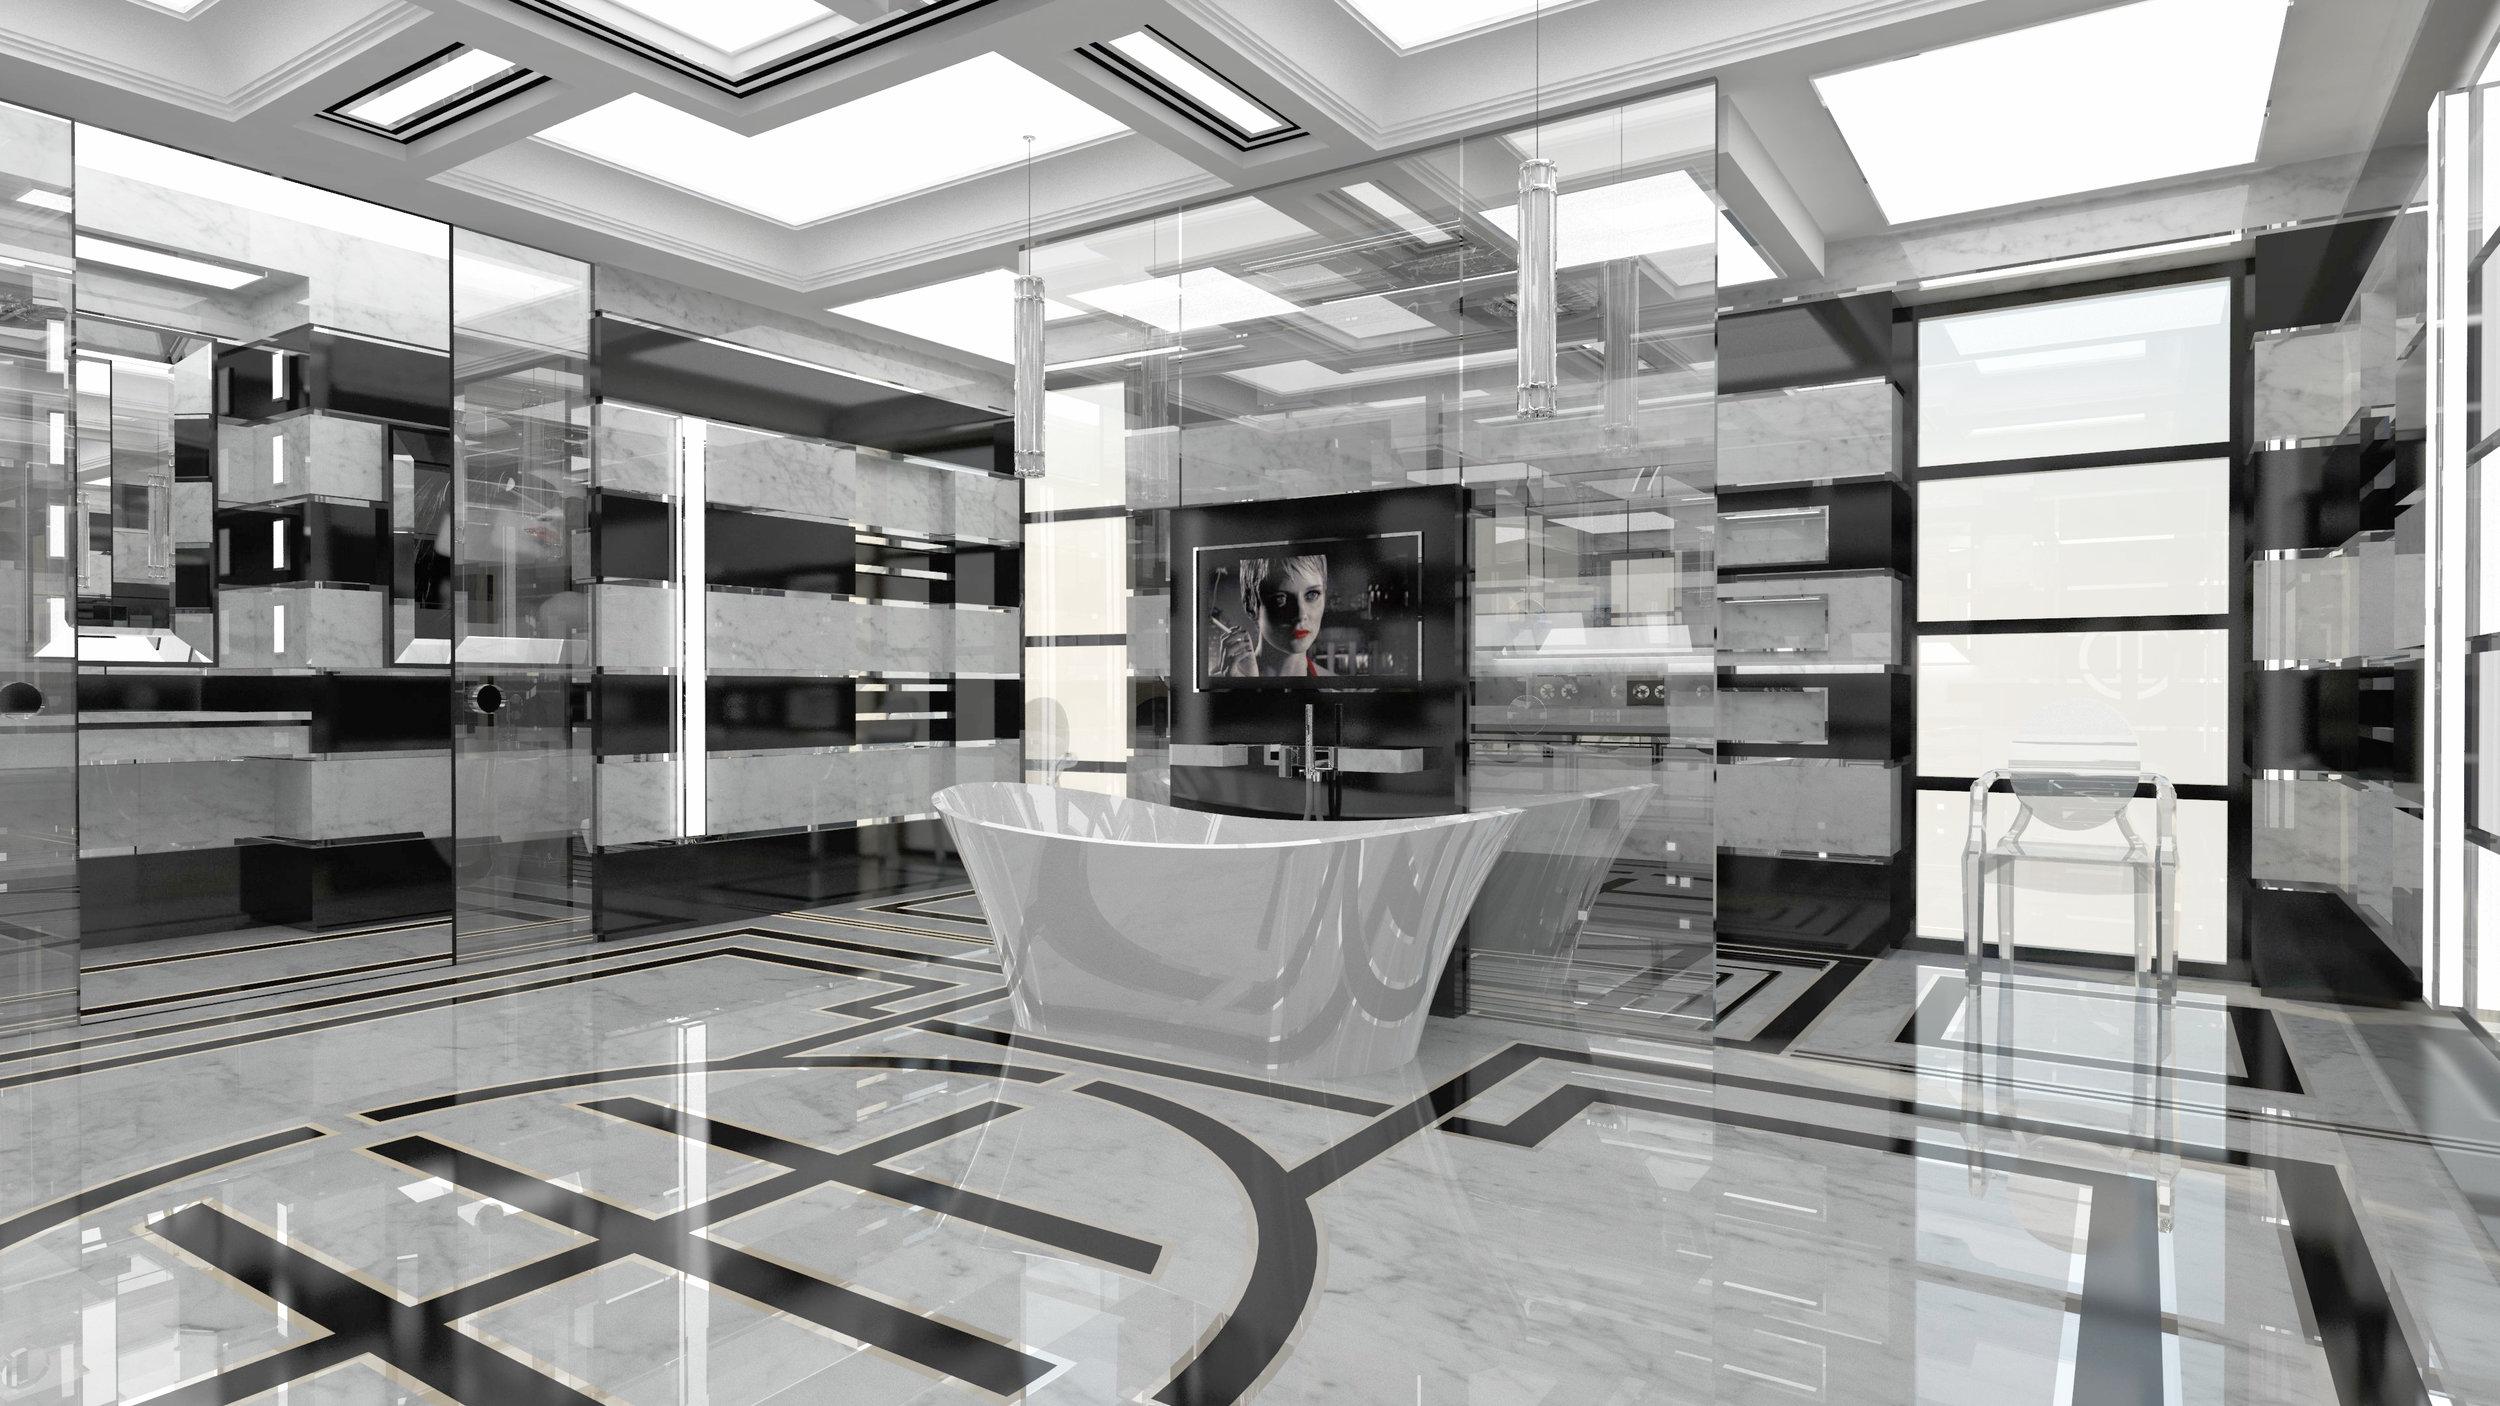 PIC 8 ANGEL MARTIN - PROJECT 1 - DESIGN PROCESS - BATHROOM RENDER.jpeg